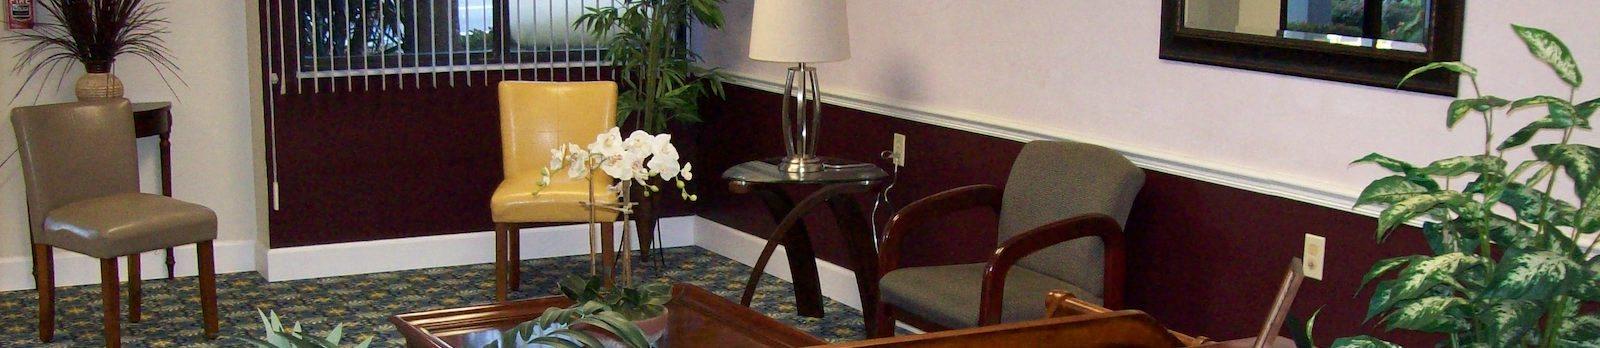 Orlando Cloisters Senior Apartments in Orlando, FL banner image